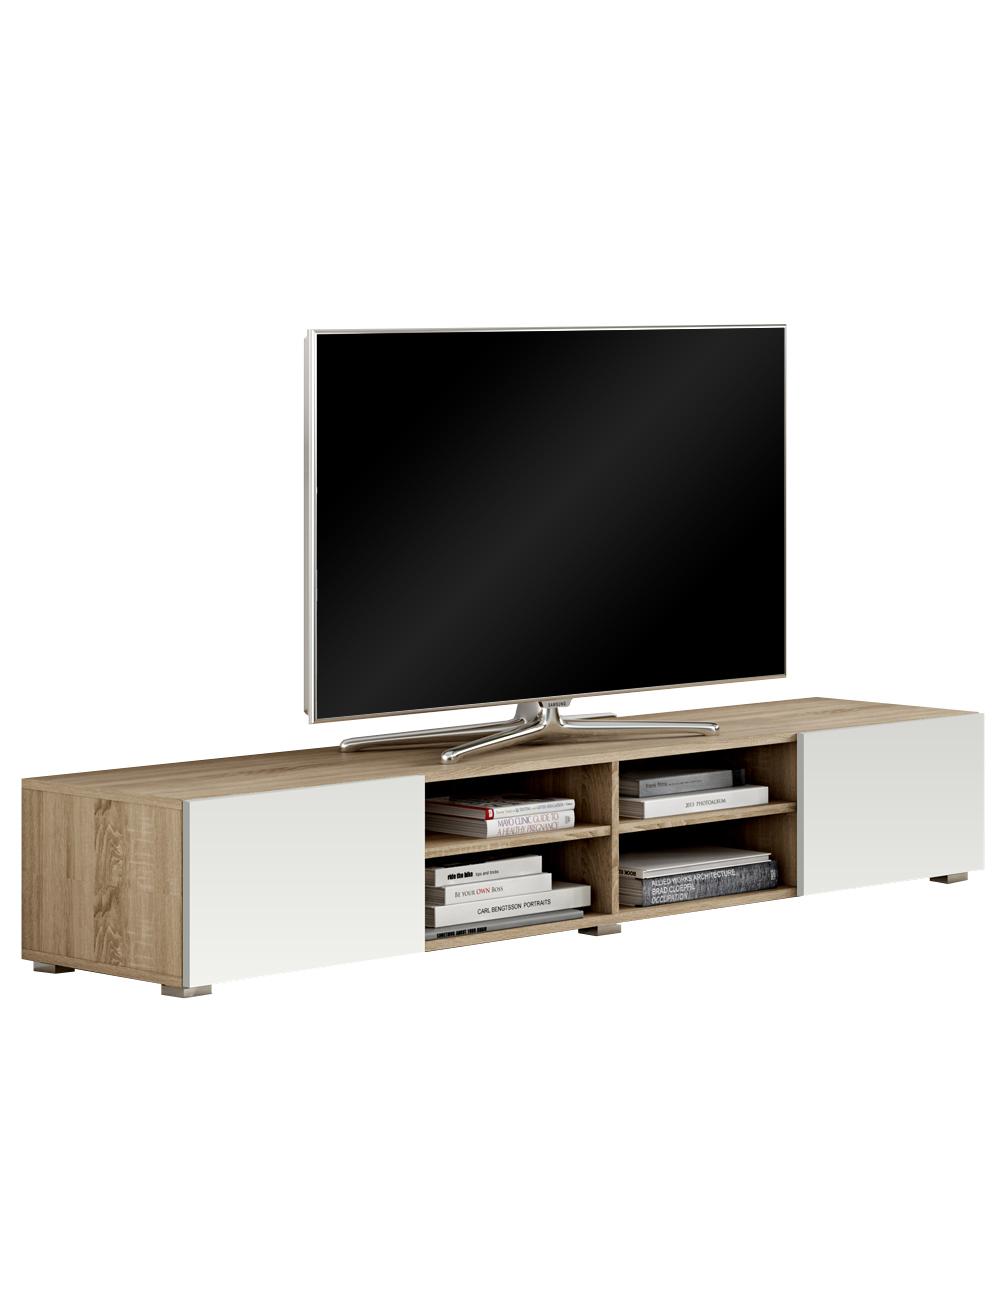 matratze prestige feste ausf hrung 160 x 200 cm. Black Bedroom Furniture Sets. Home Design Ideas